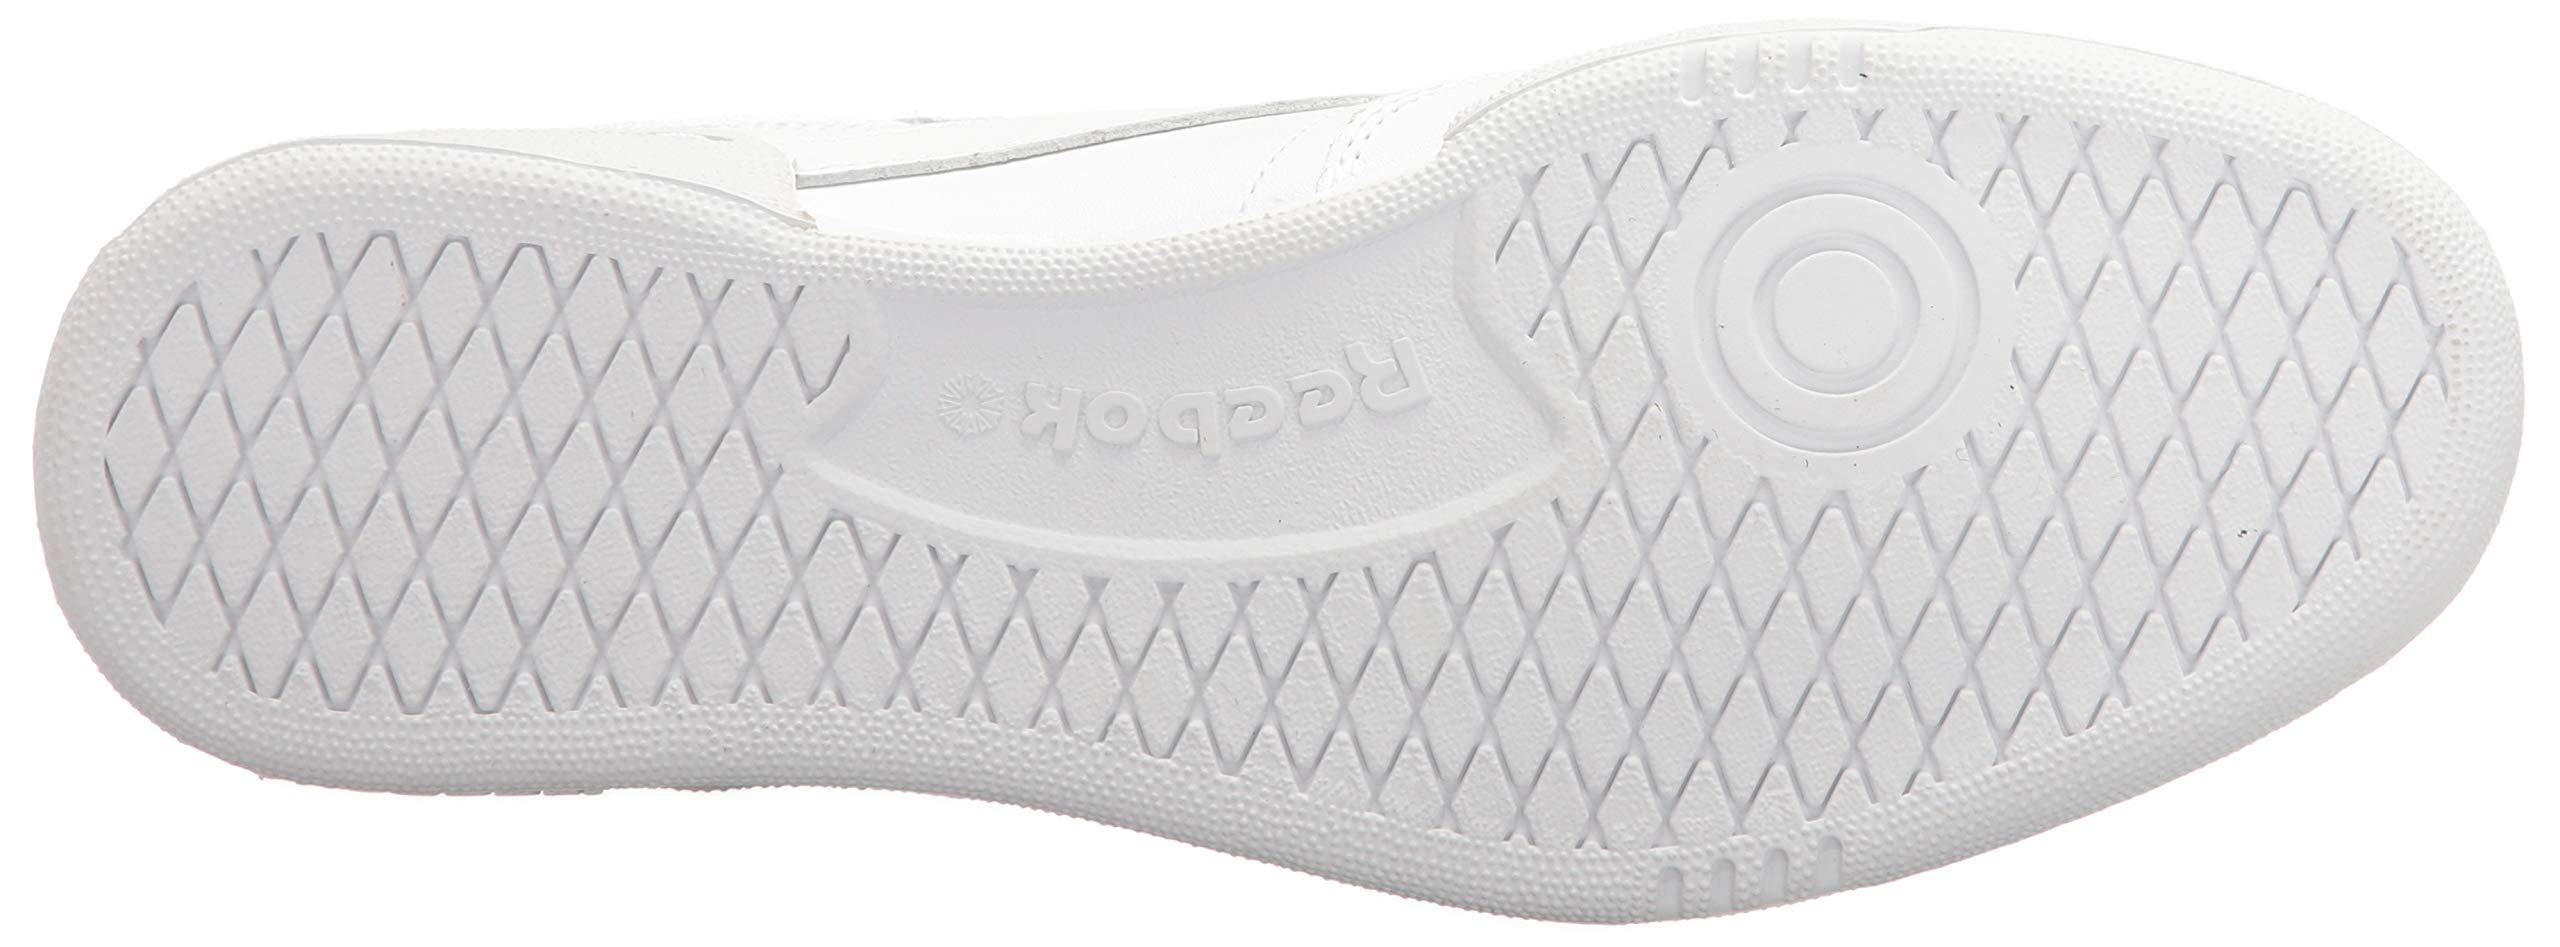 cae4d408c8927 Reebok Men s Classic Renaissance Walking Shoe